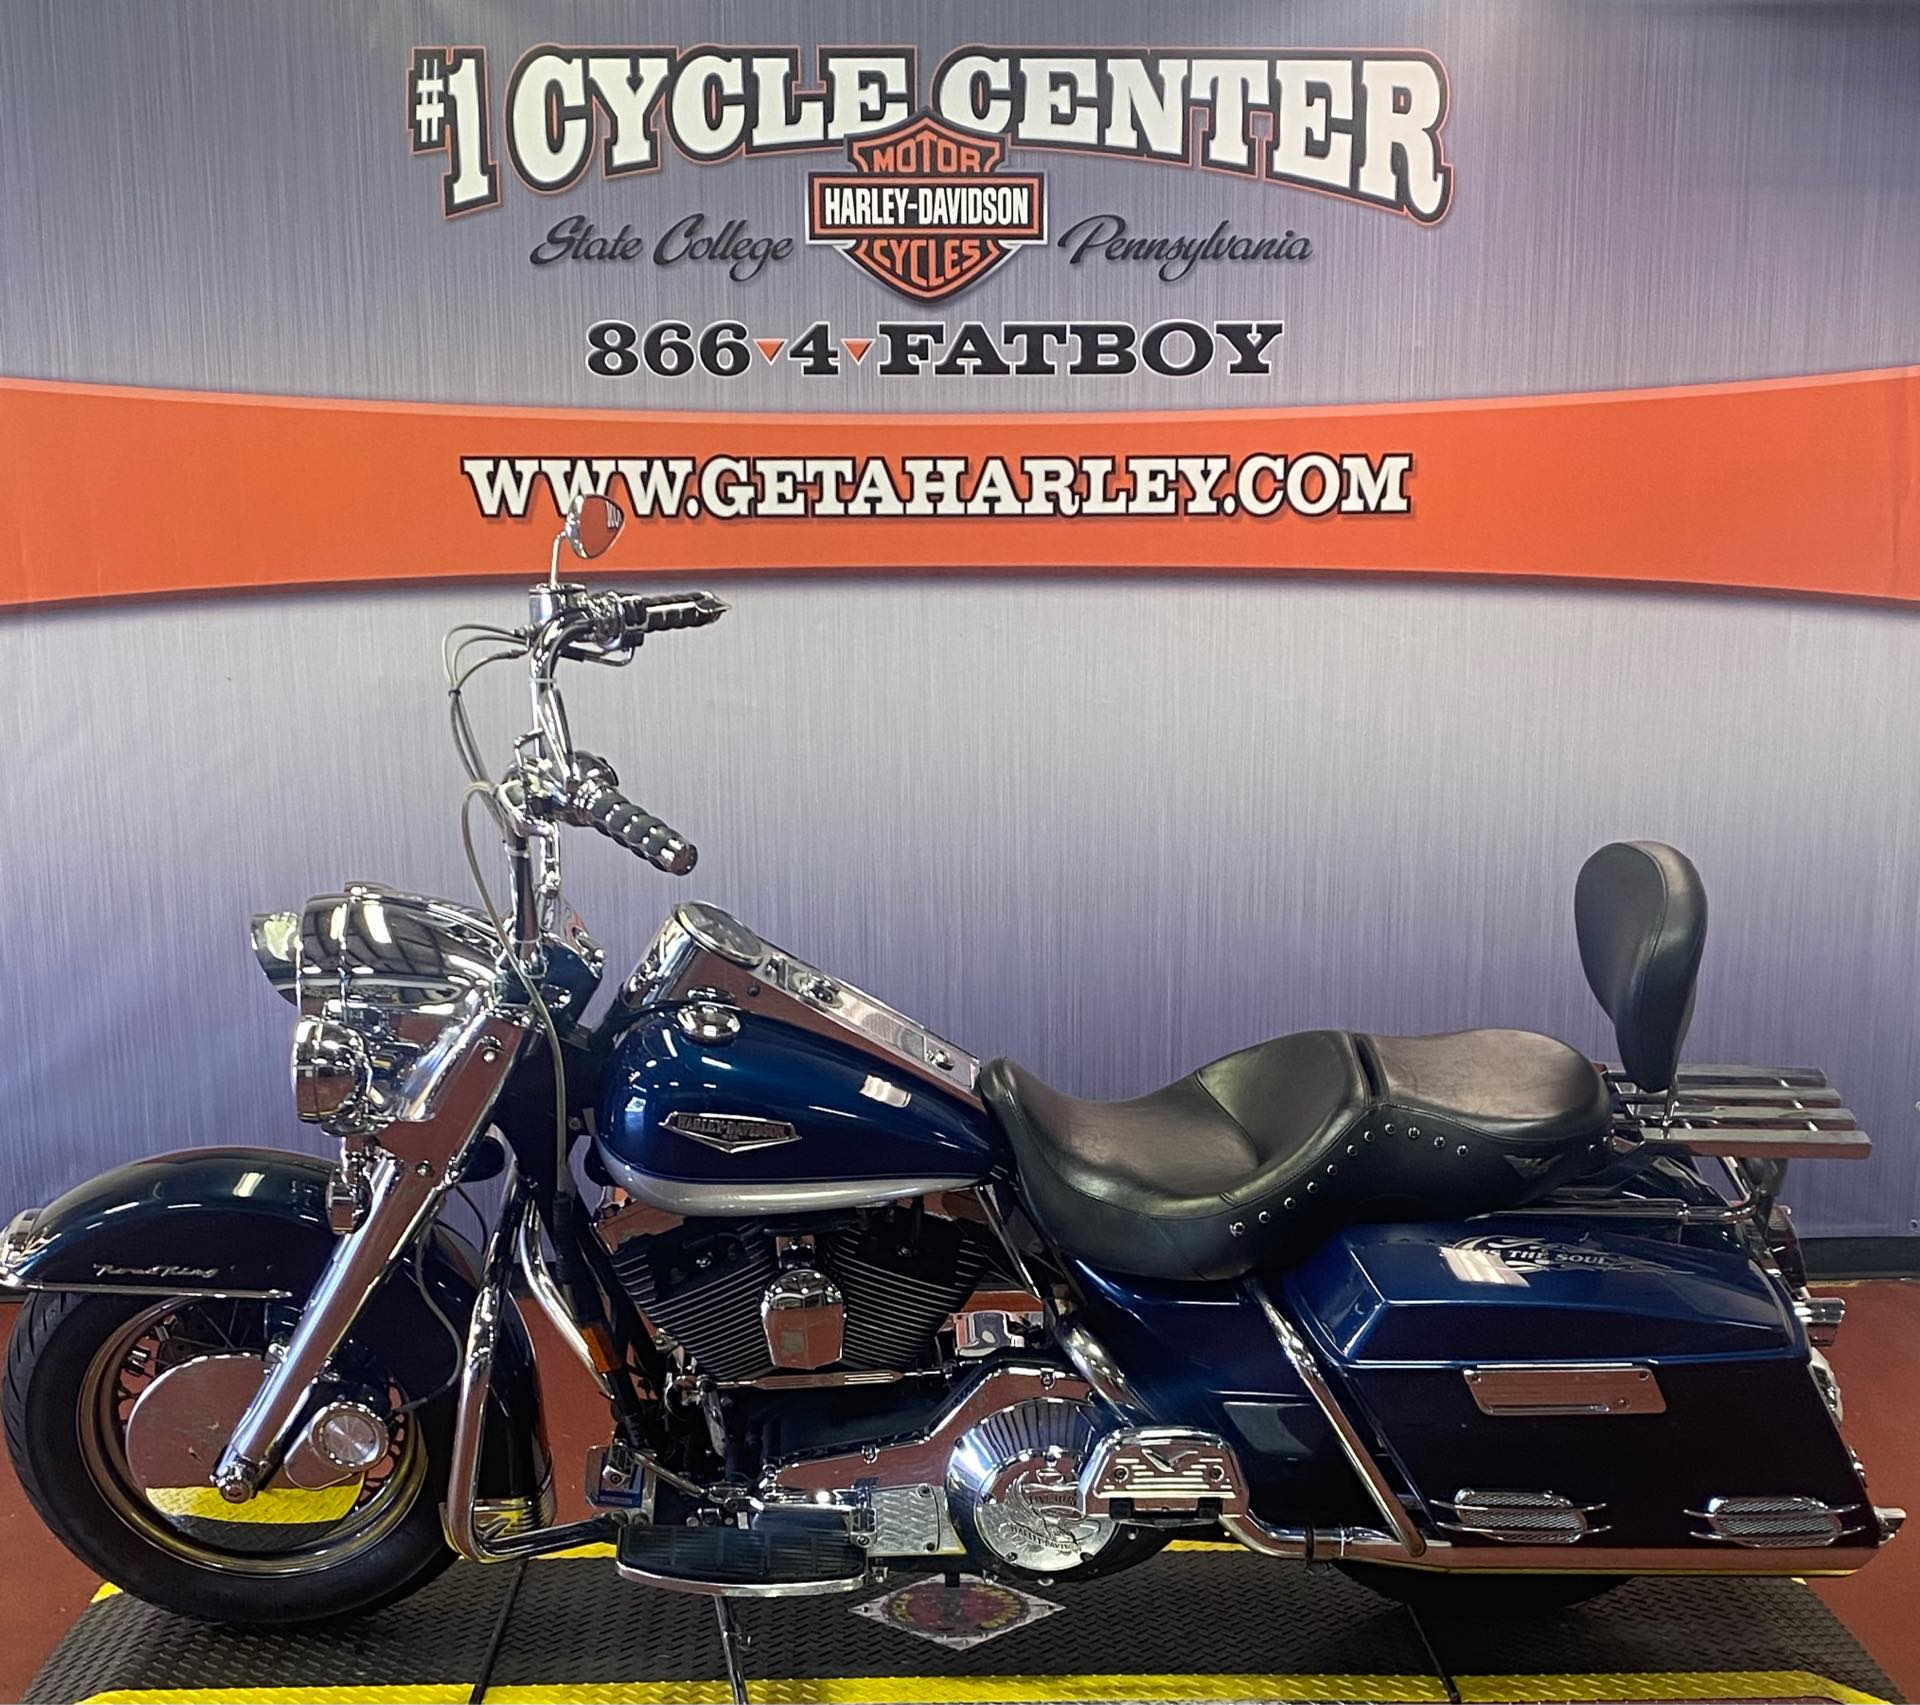 1999 Harley-Davidson FLHRC-I at #1 Cycle Center Harley-Davidson